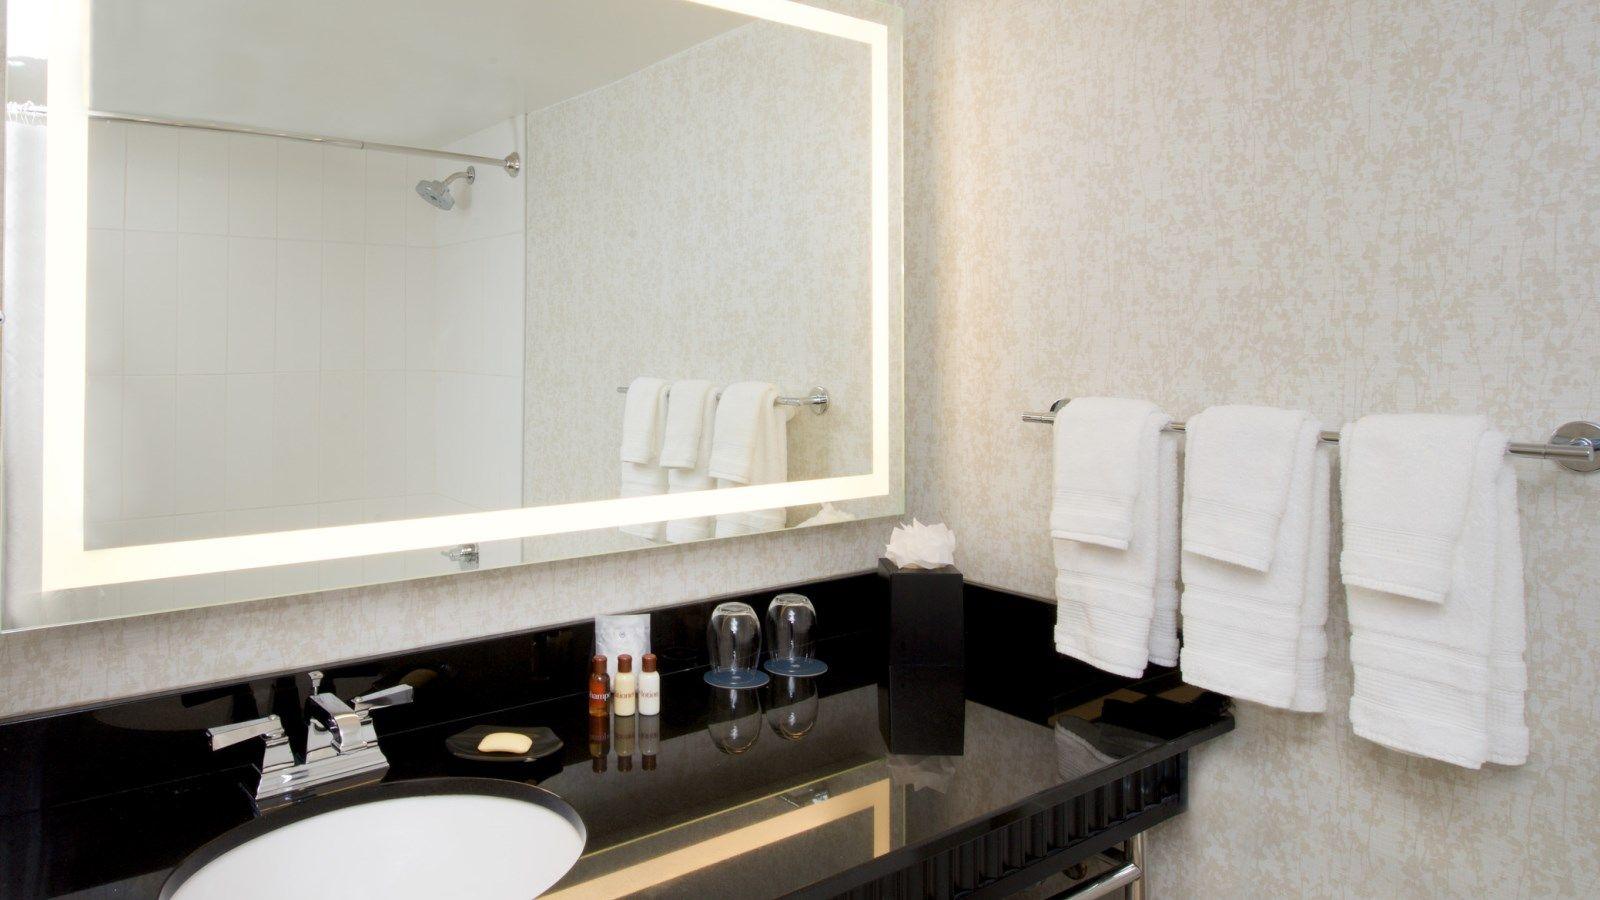 Sheraton Miami Airport Hotel & Executive Meeting Center image 11